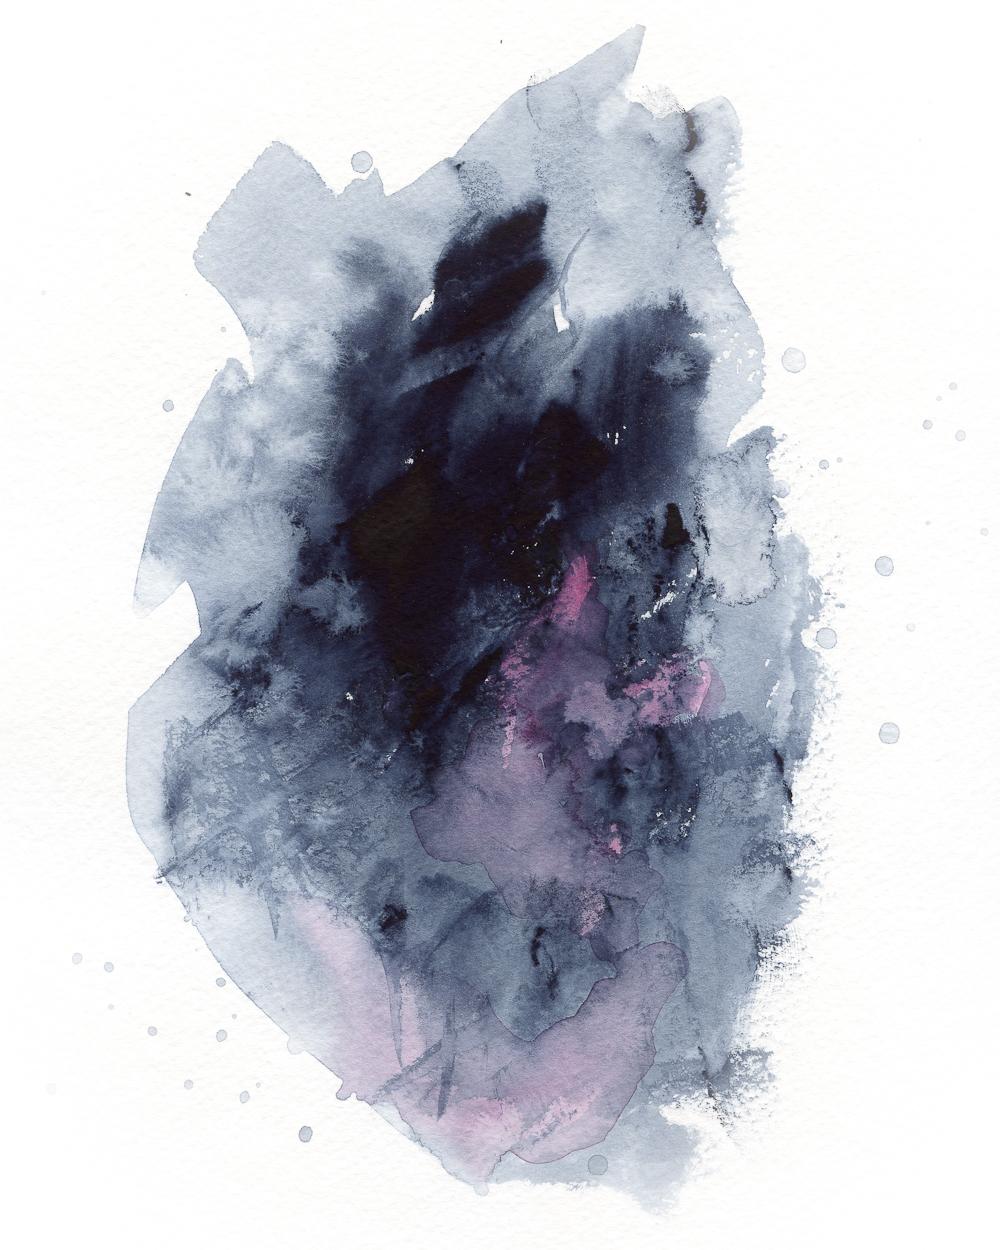 watercolor002.jpg